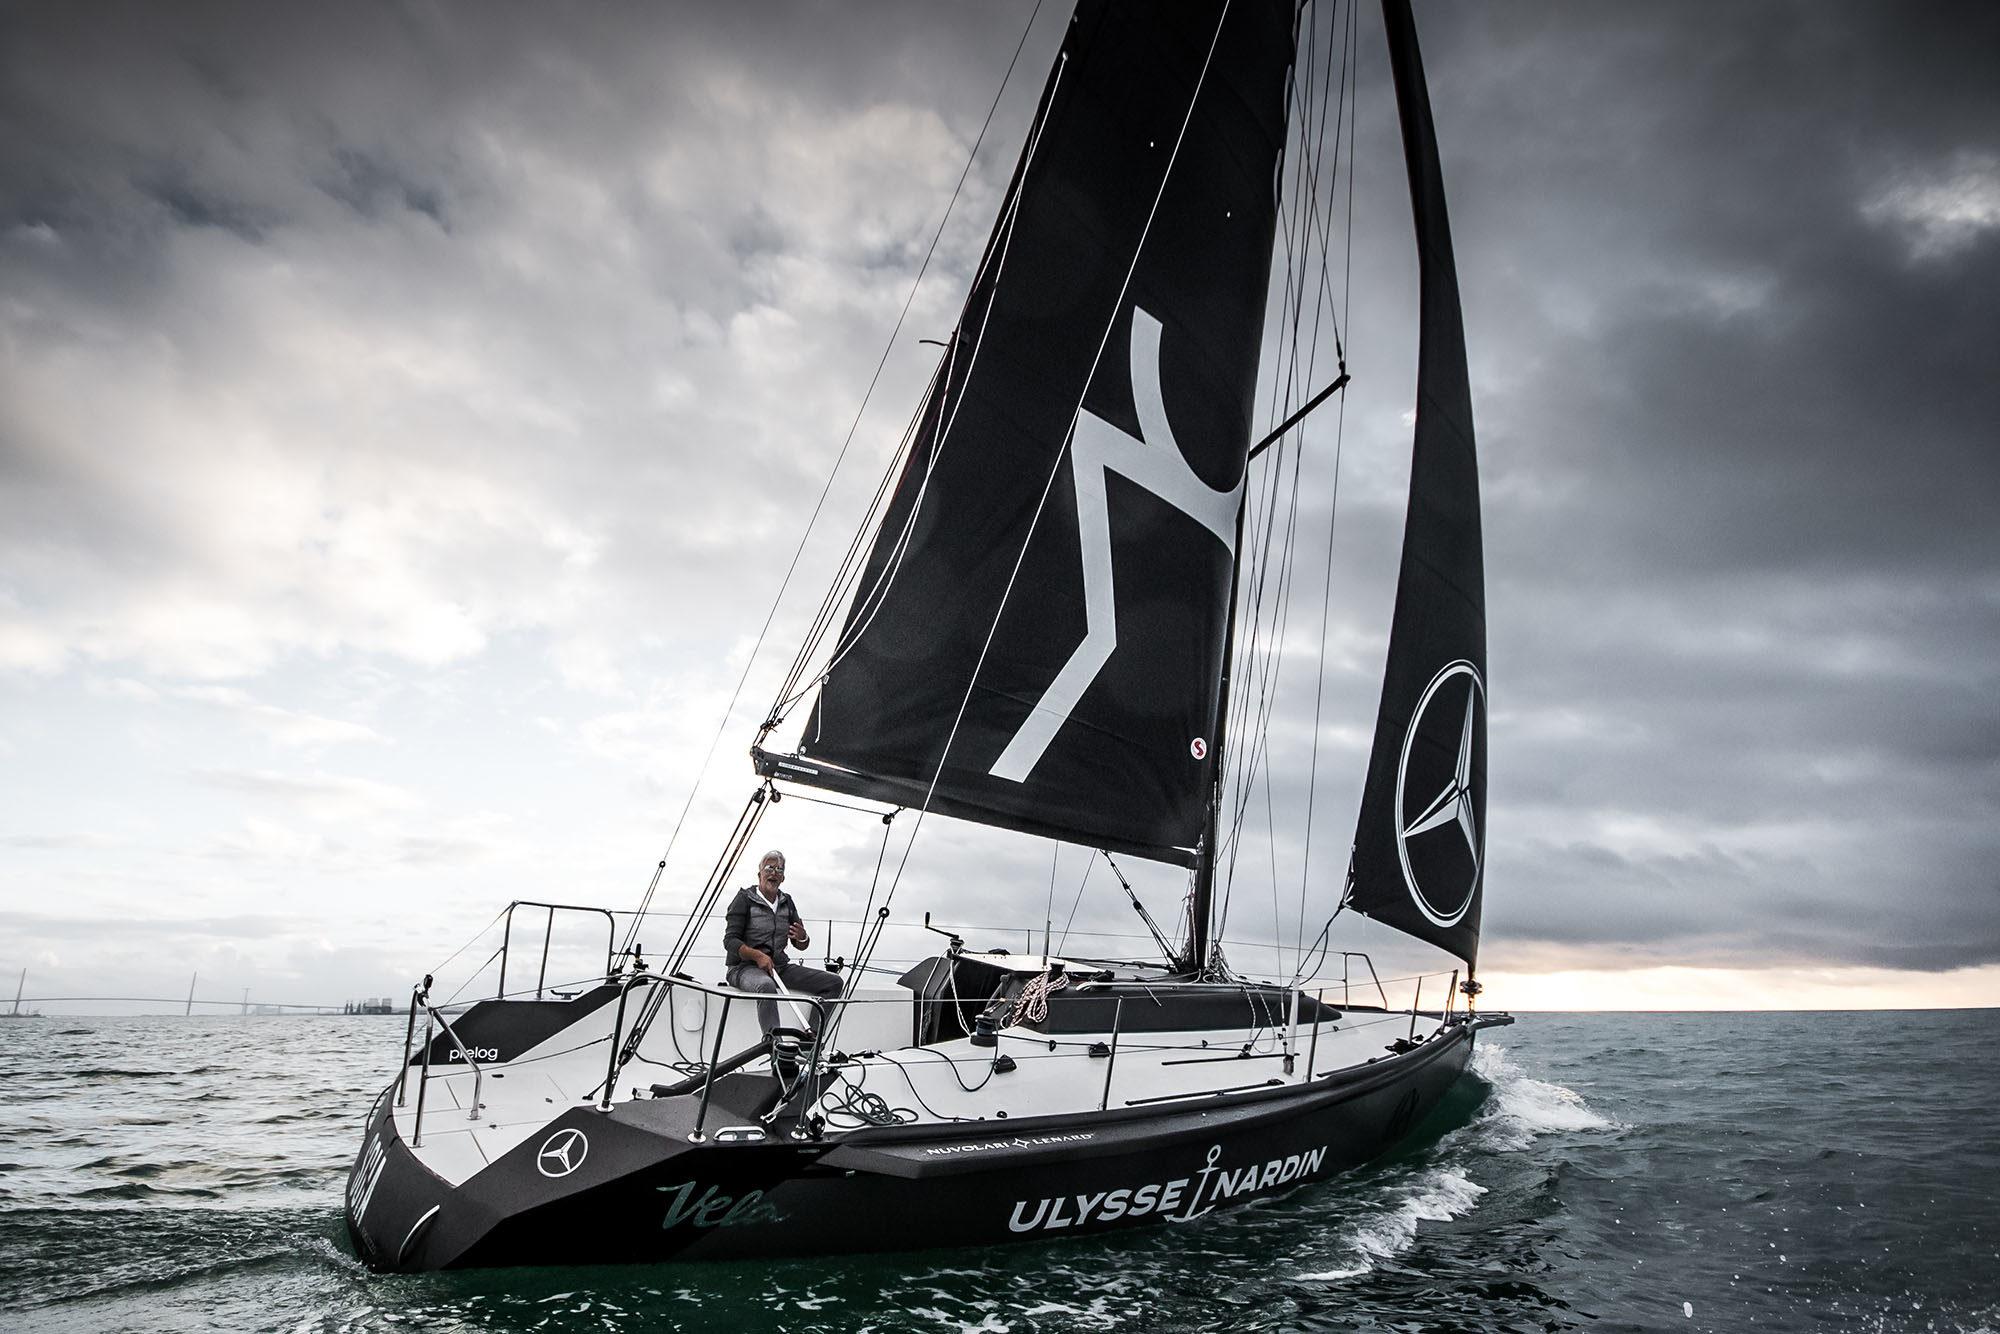 A New Ulysses For The Sake Of The Seas   Ulysse Nardin